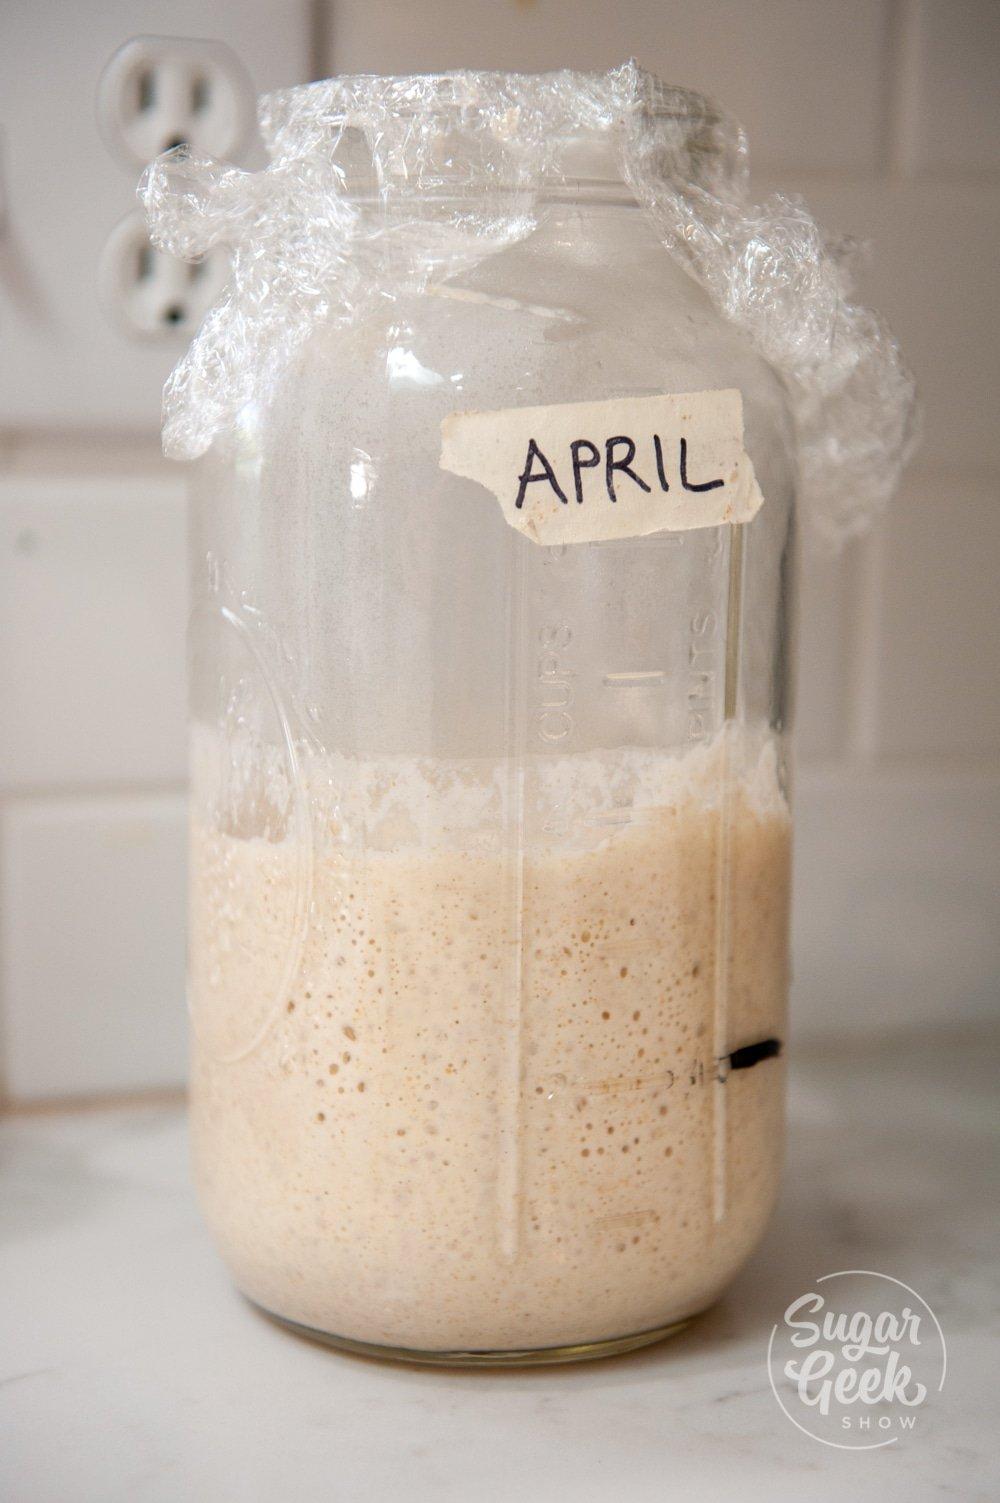 sourdough starter in clear jar labeled april